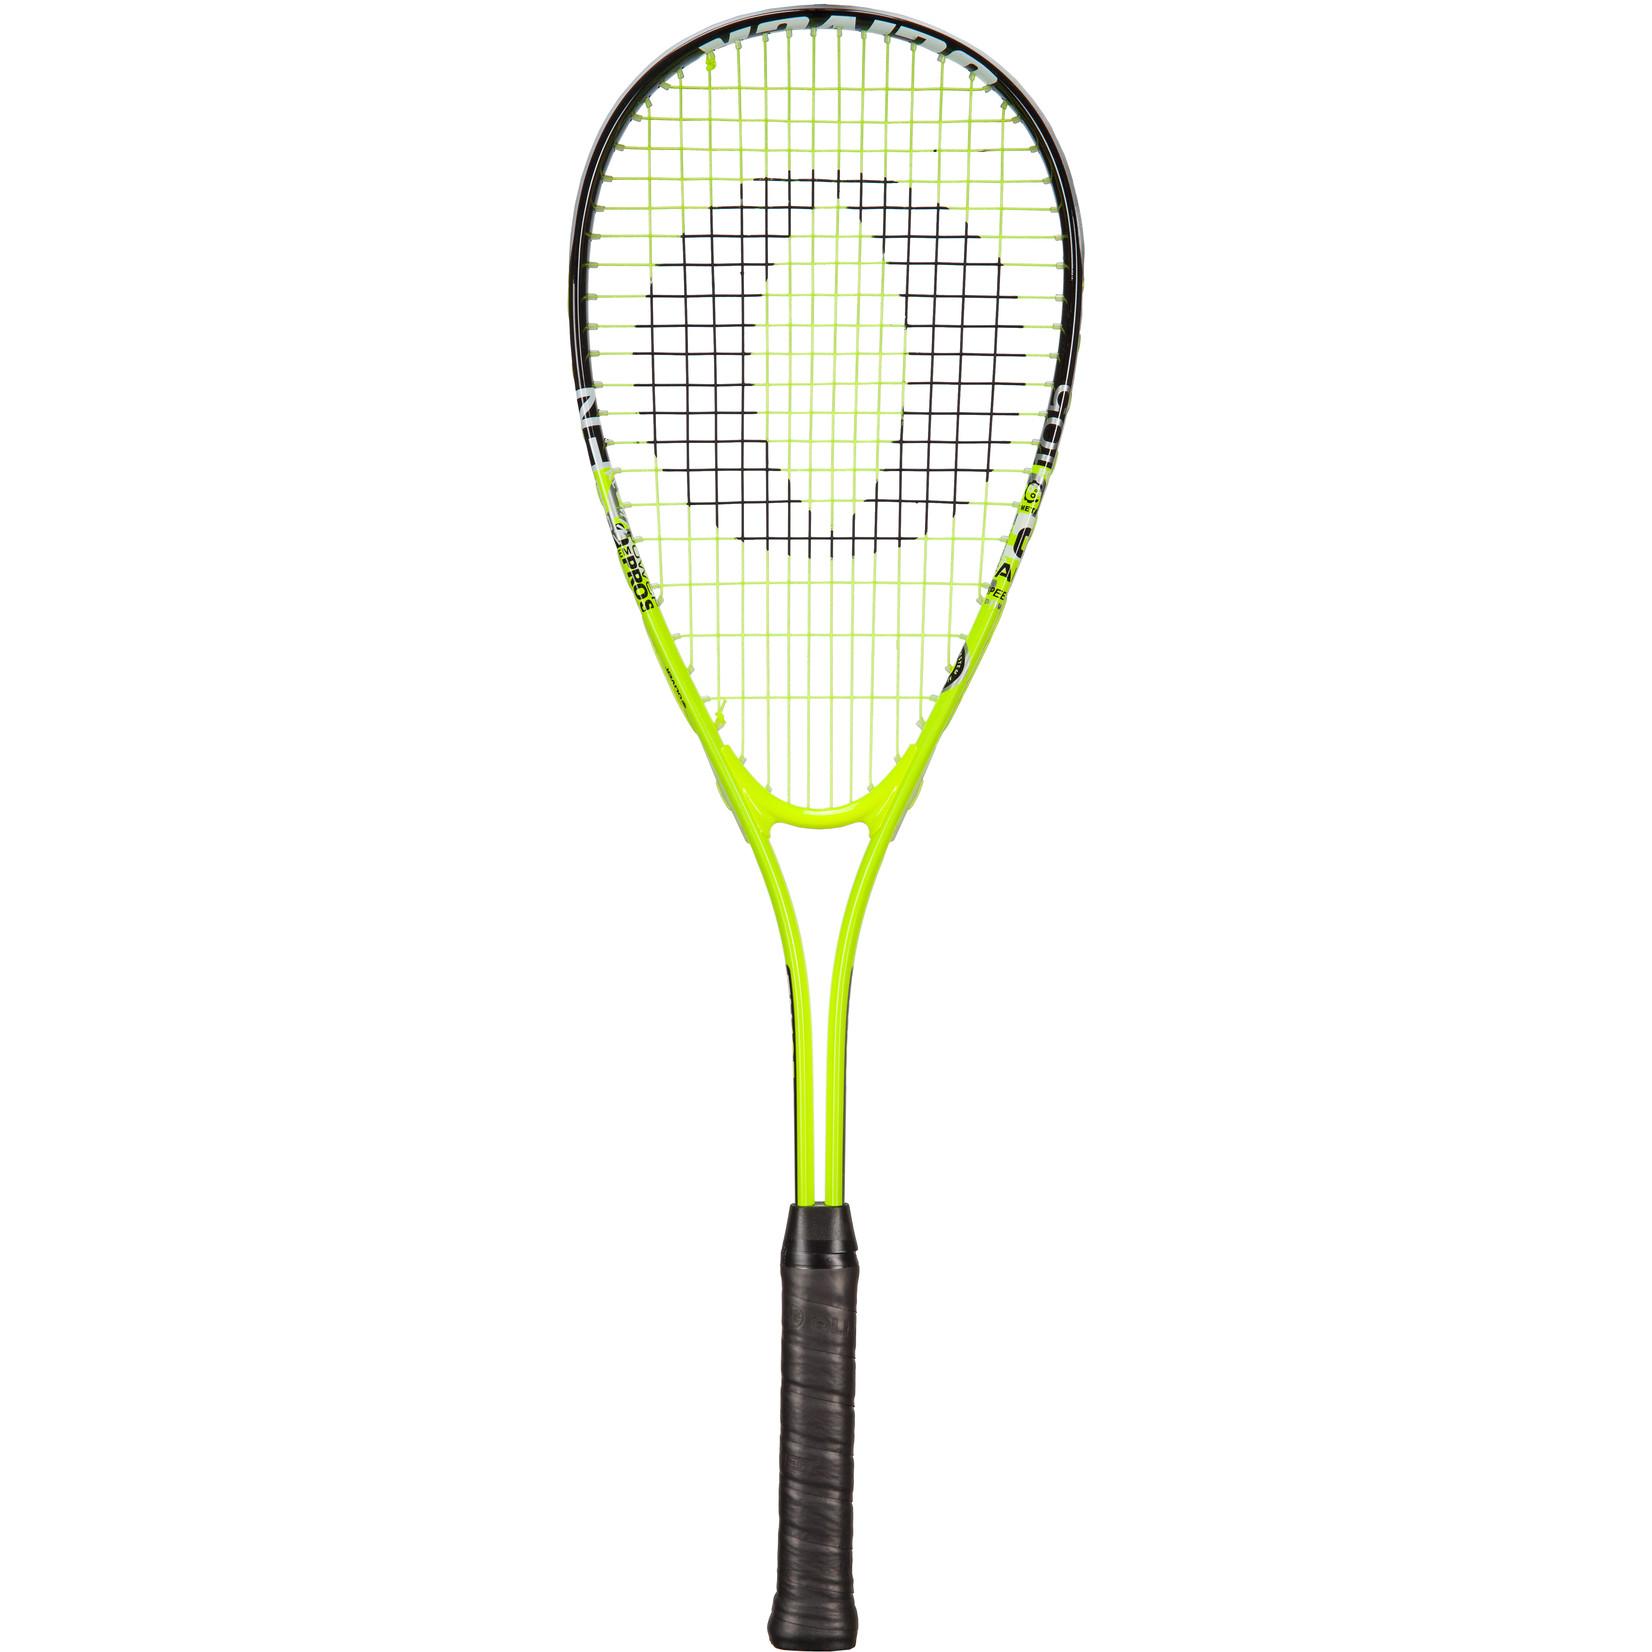 Oliver FN 105 alu squashracket Yellow